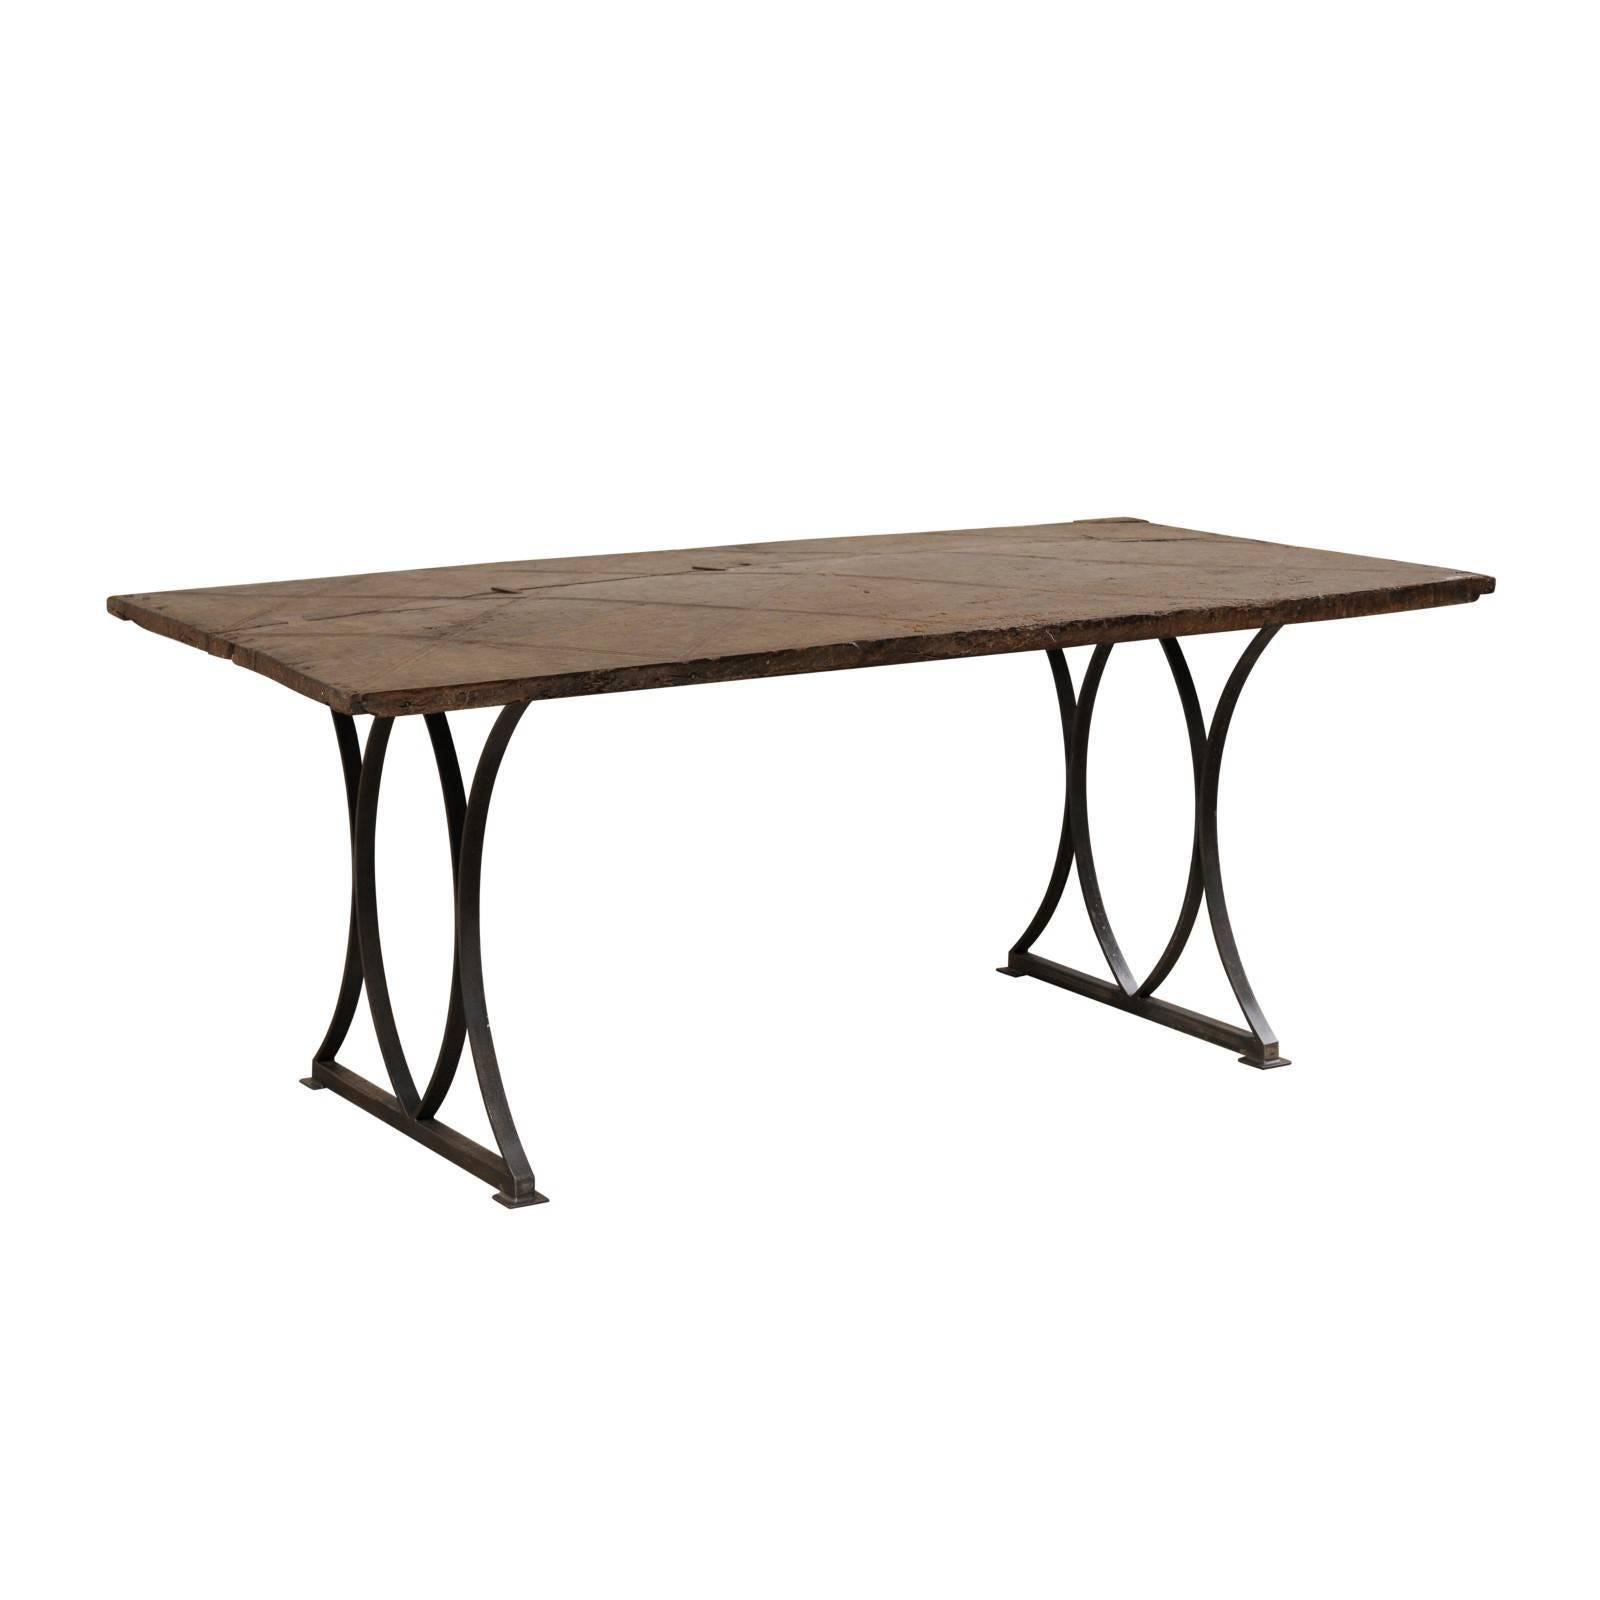 18th Century Spanish Door Made Custom Desk or Table with Iron Trestle Legs